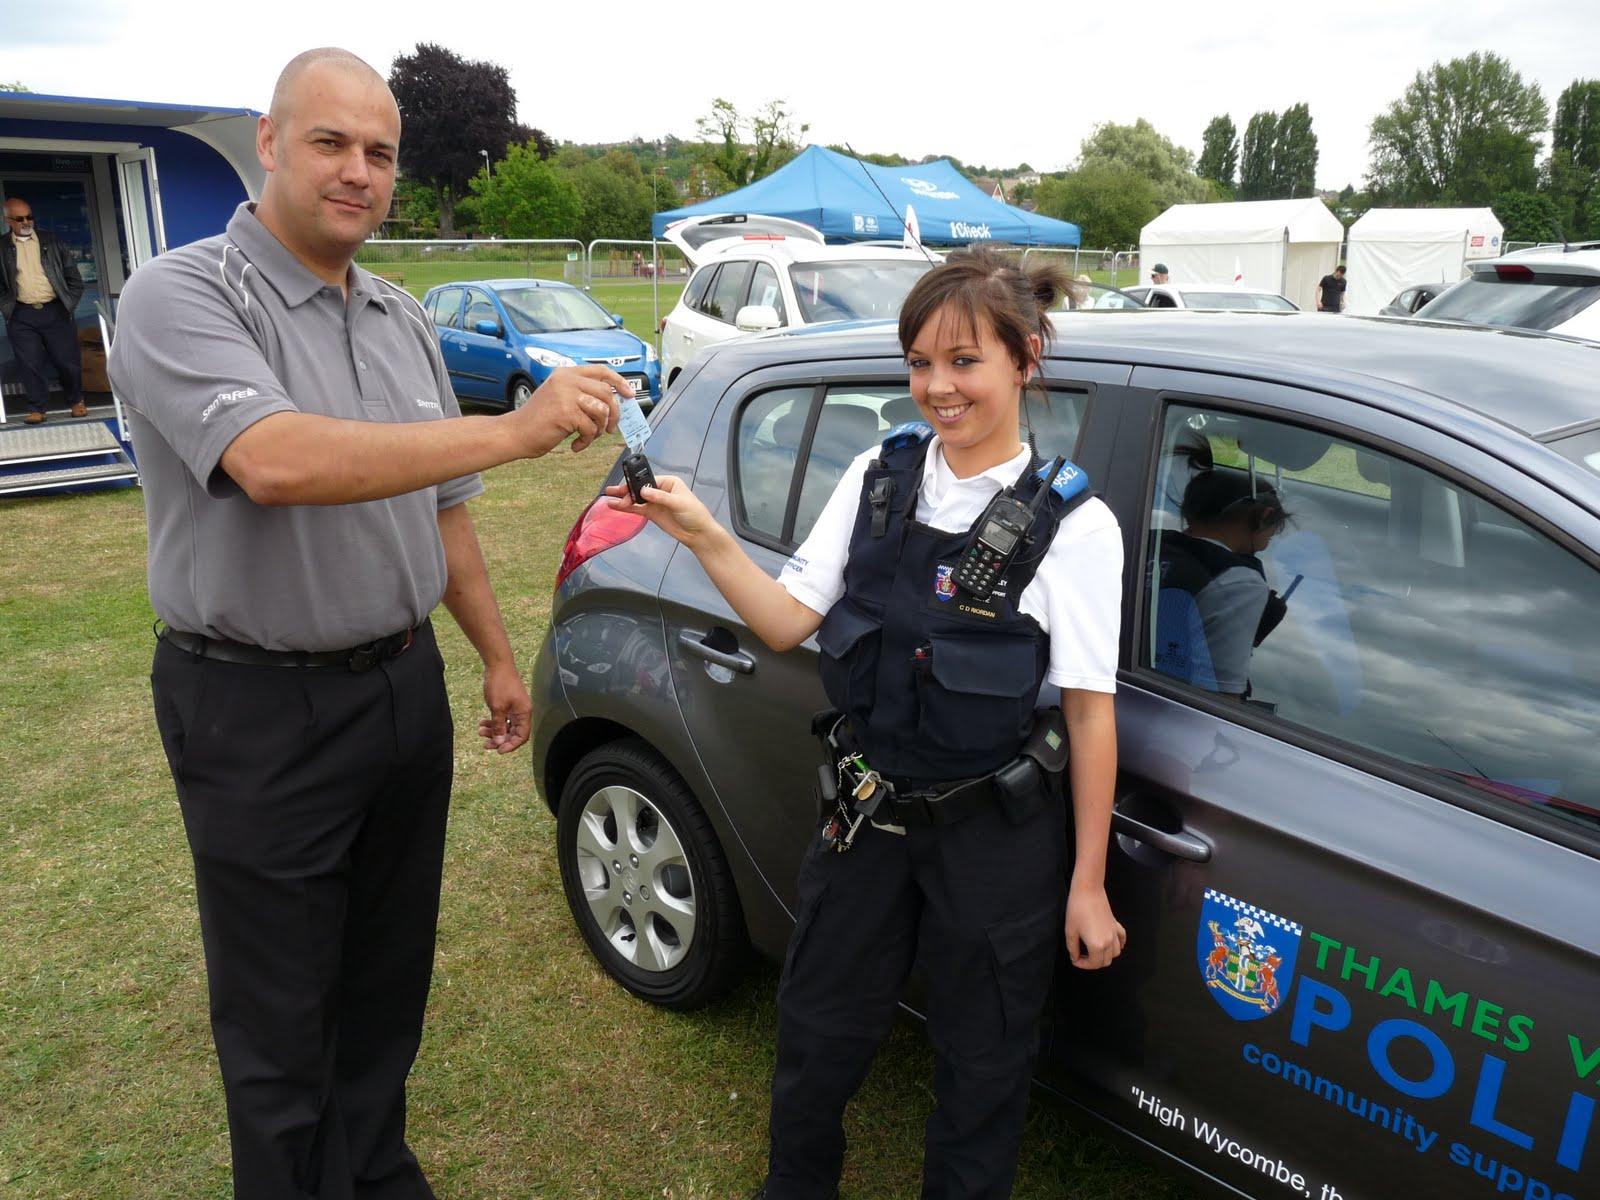 Platts hyundai used car dealership in high wycombe -